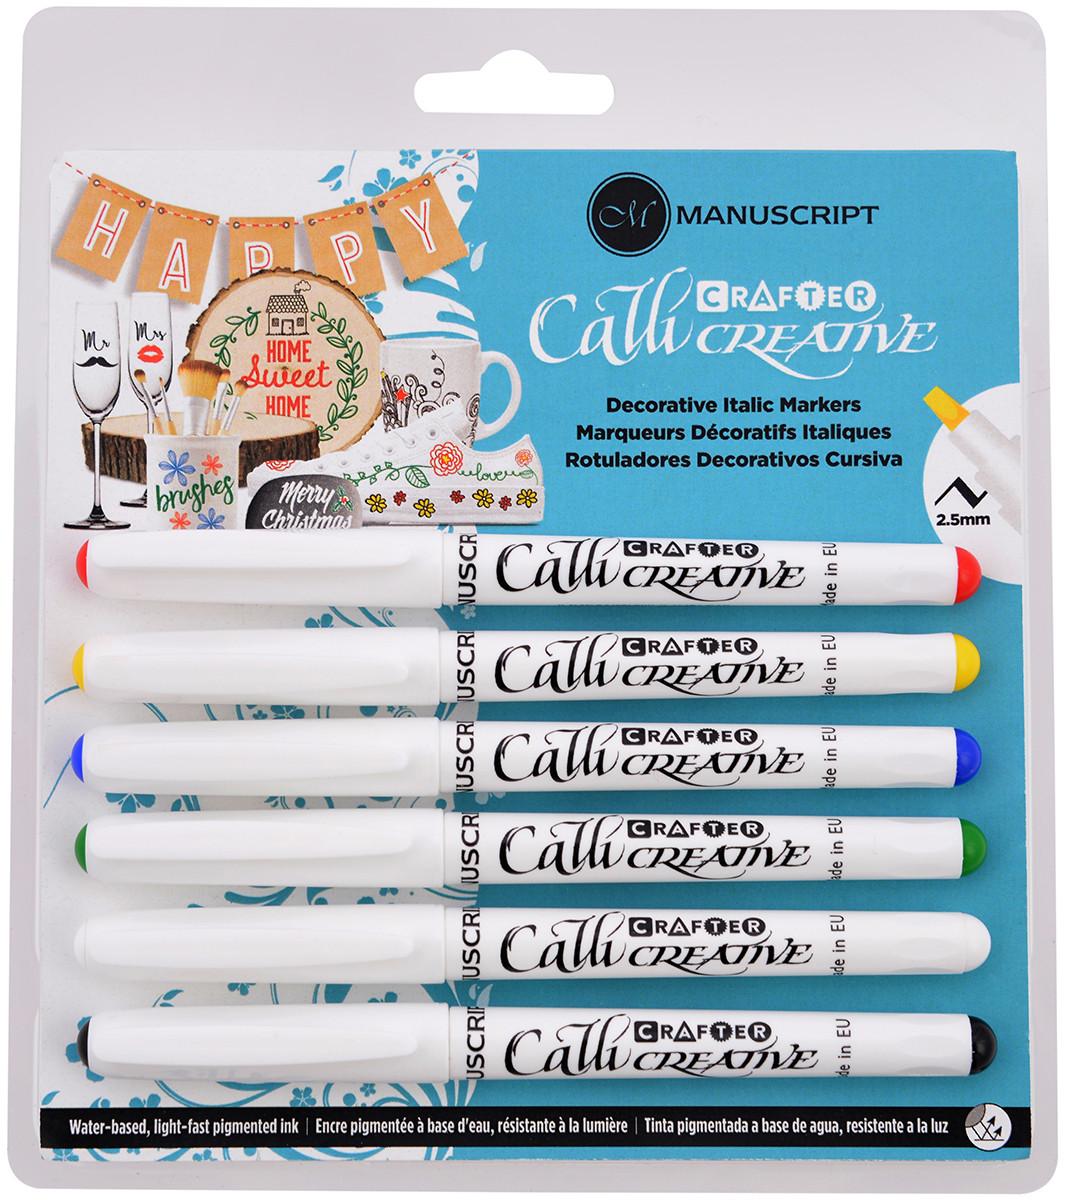 Manuscript Callicreative Crafter Markers